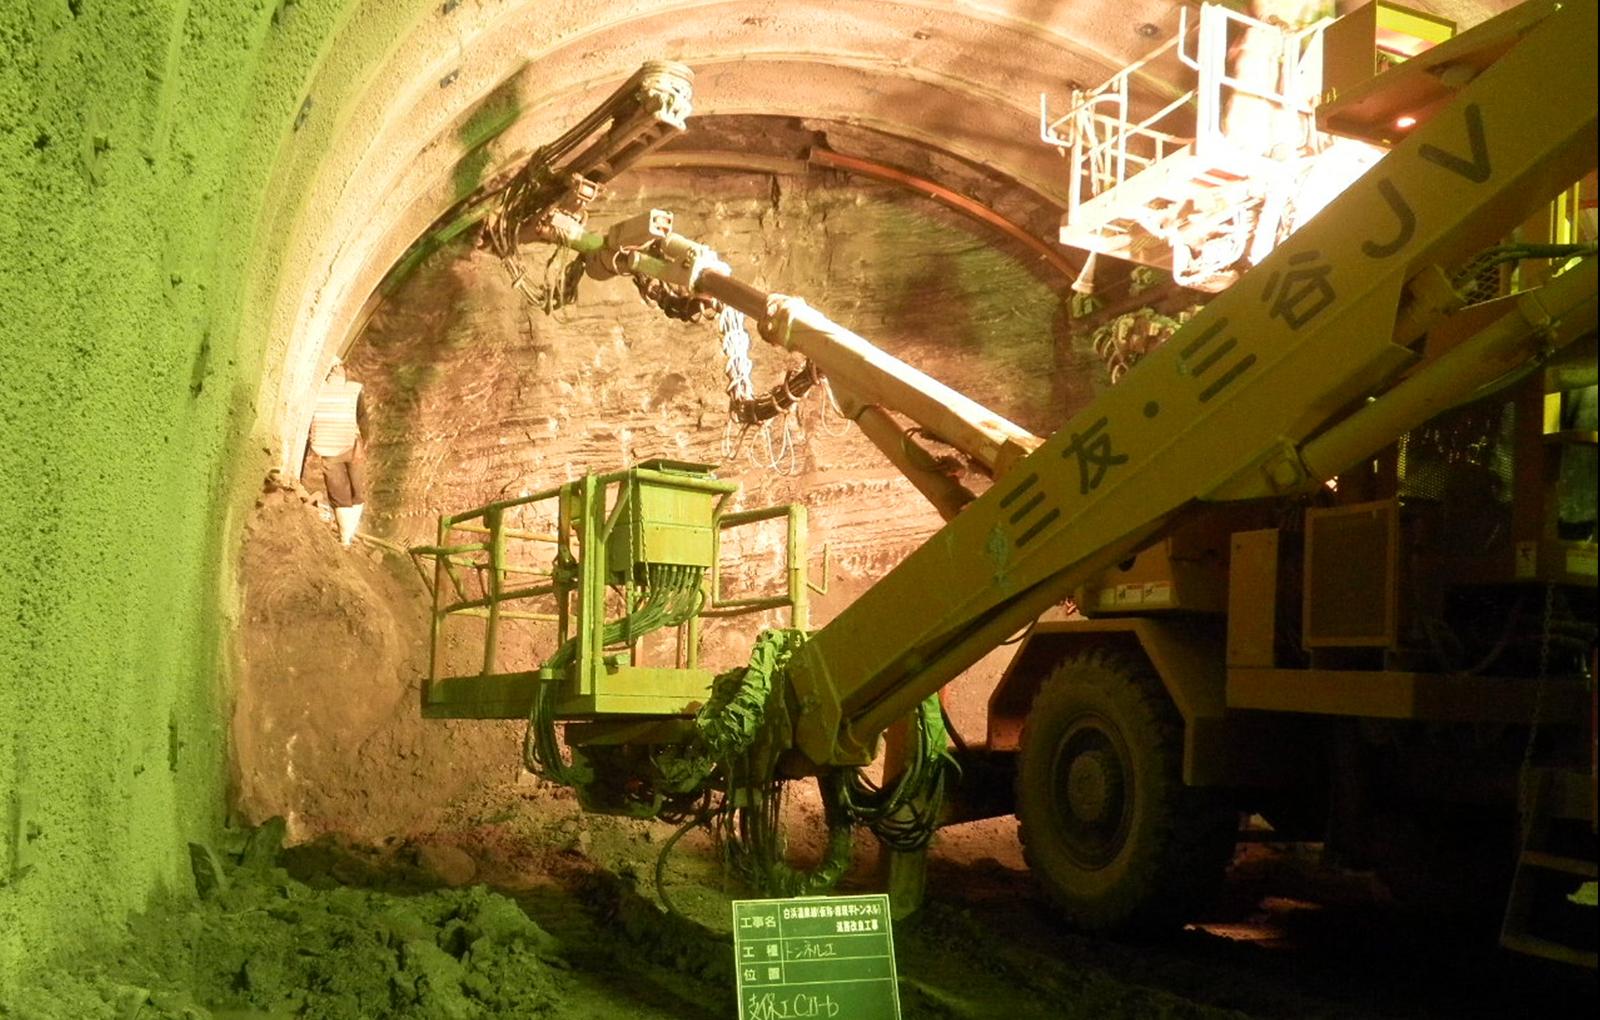 白浜温泉(仮称権現平トンネル )道路改良工事